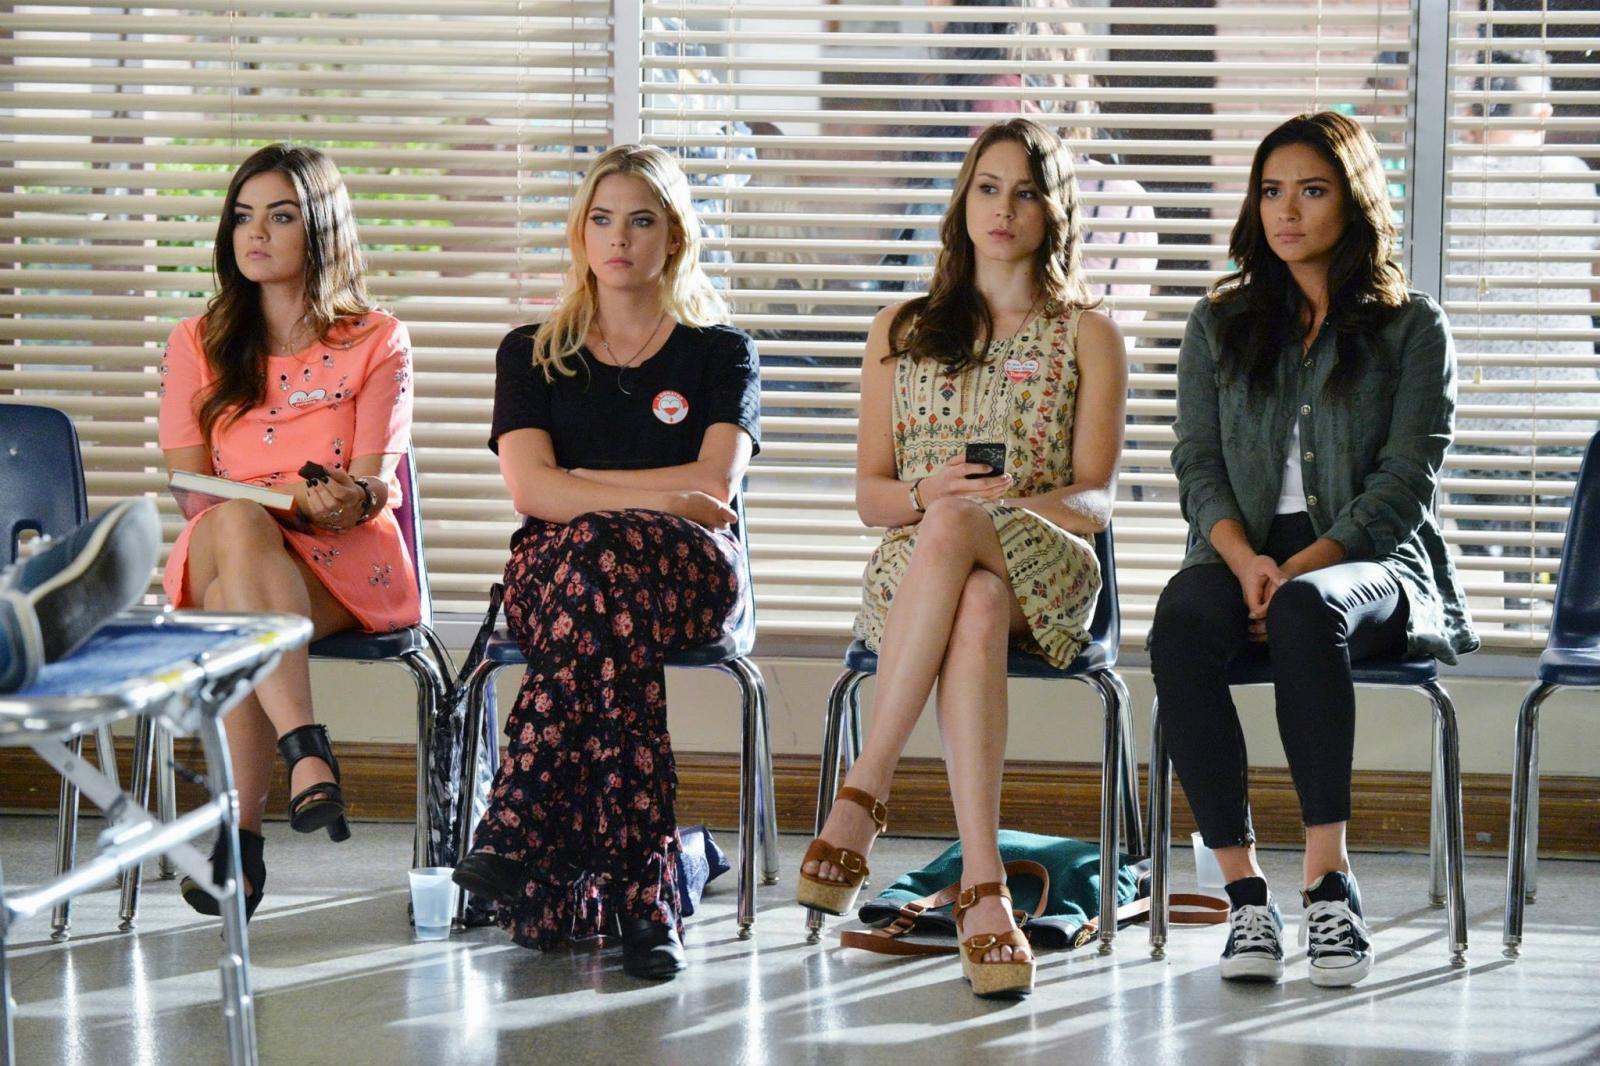 Pretty Little Liars Season 5: \'A\' will be revealed soon, teases show producer Marlene King